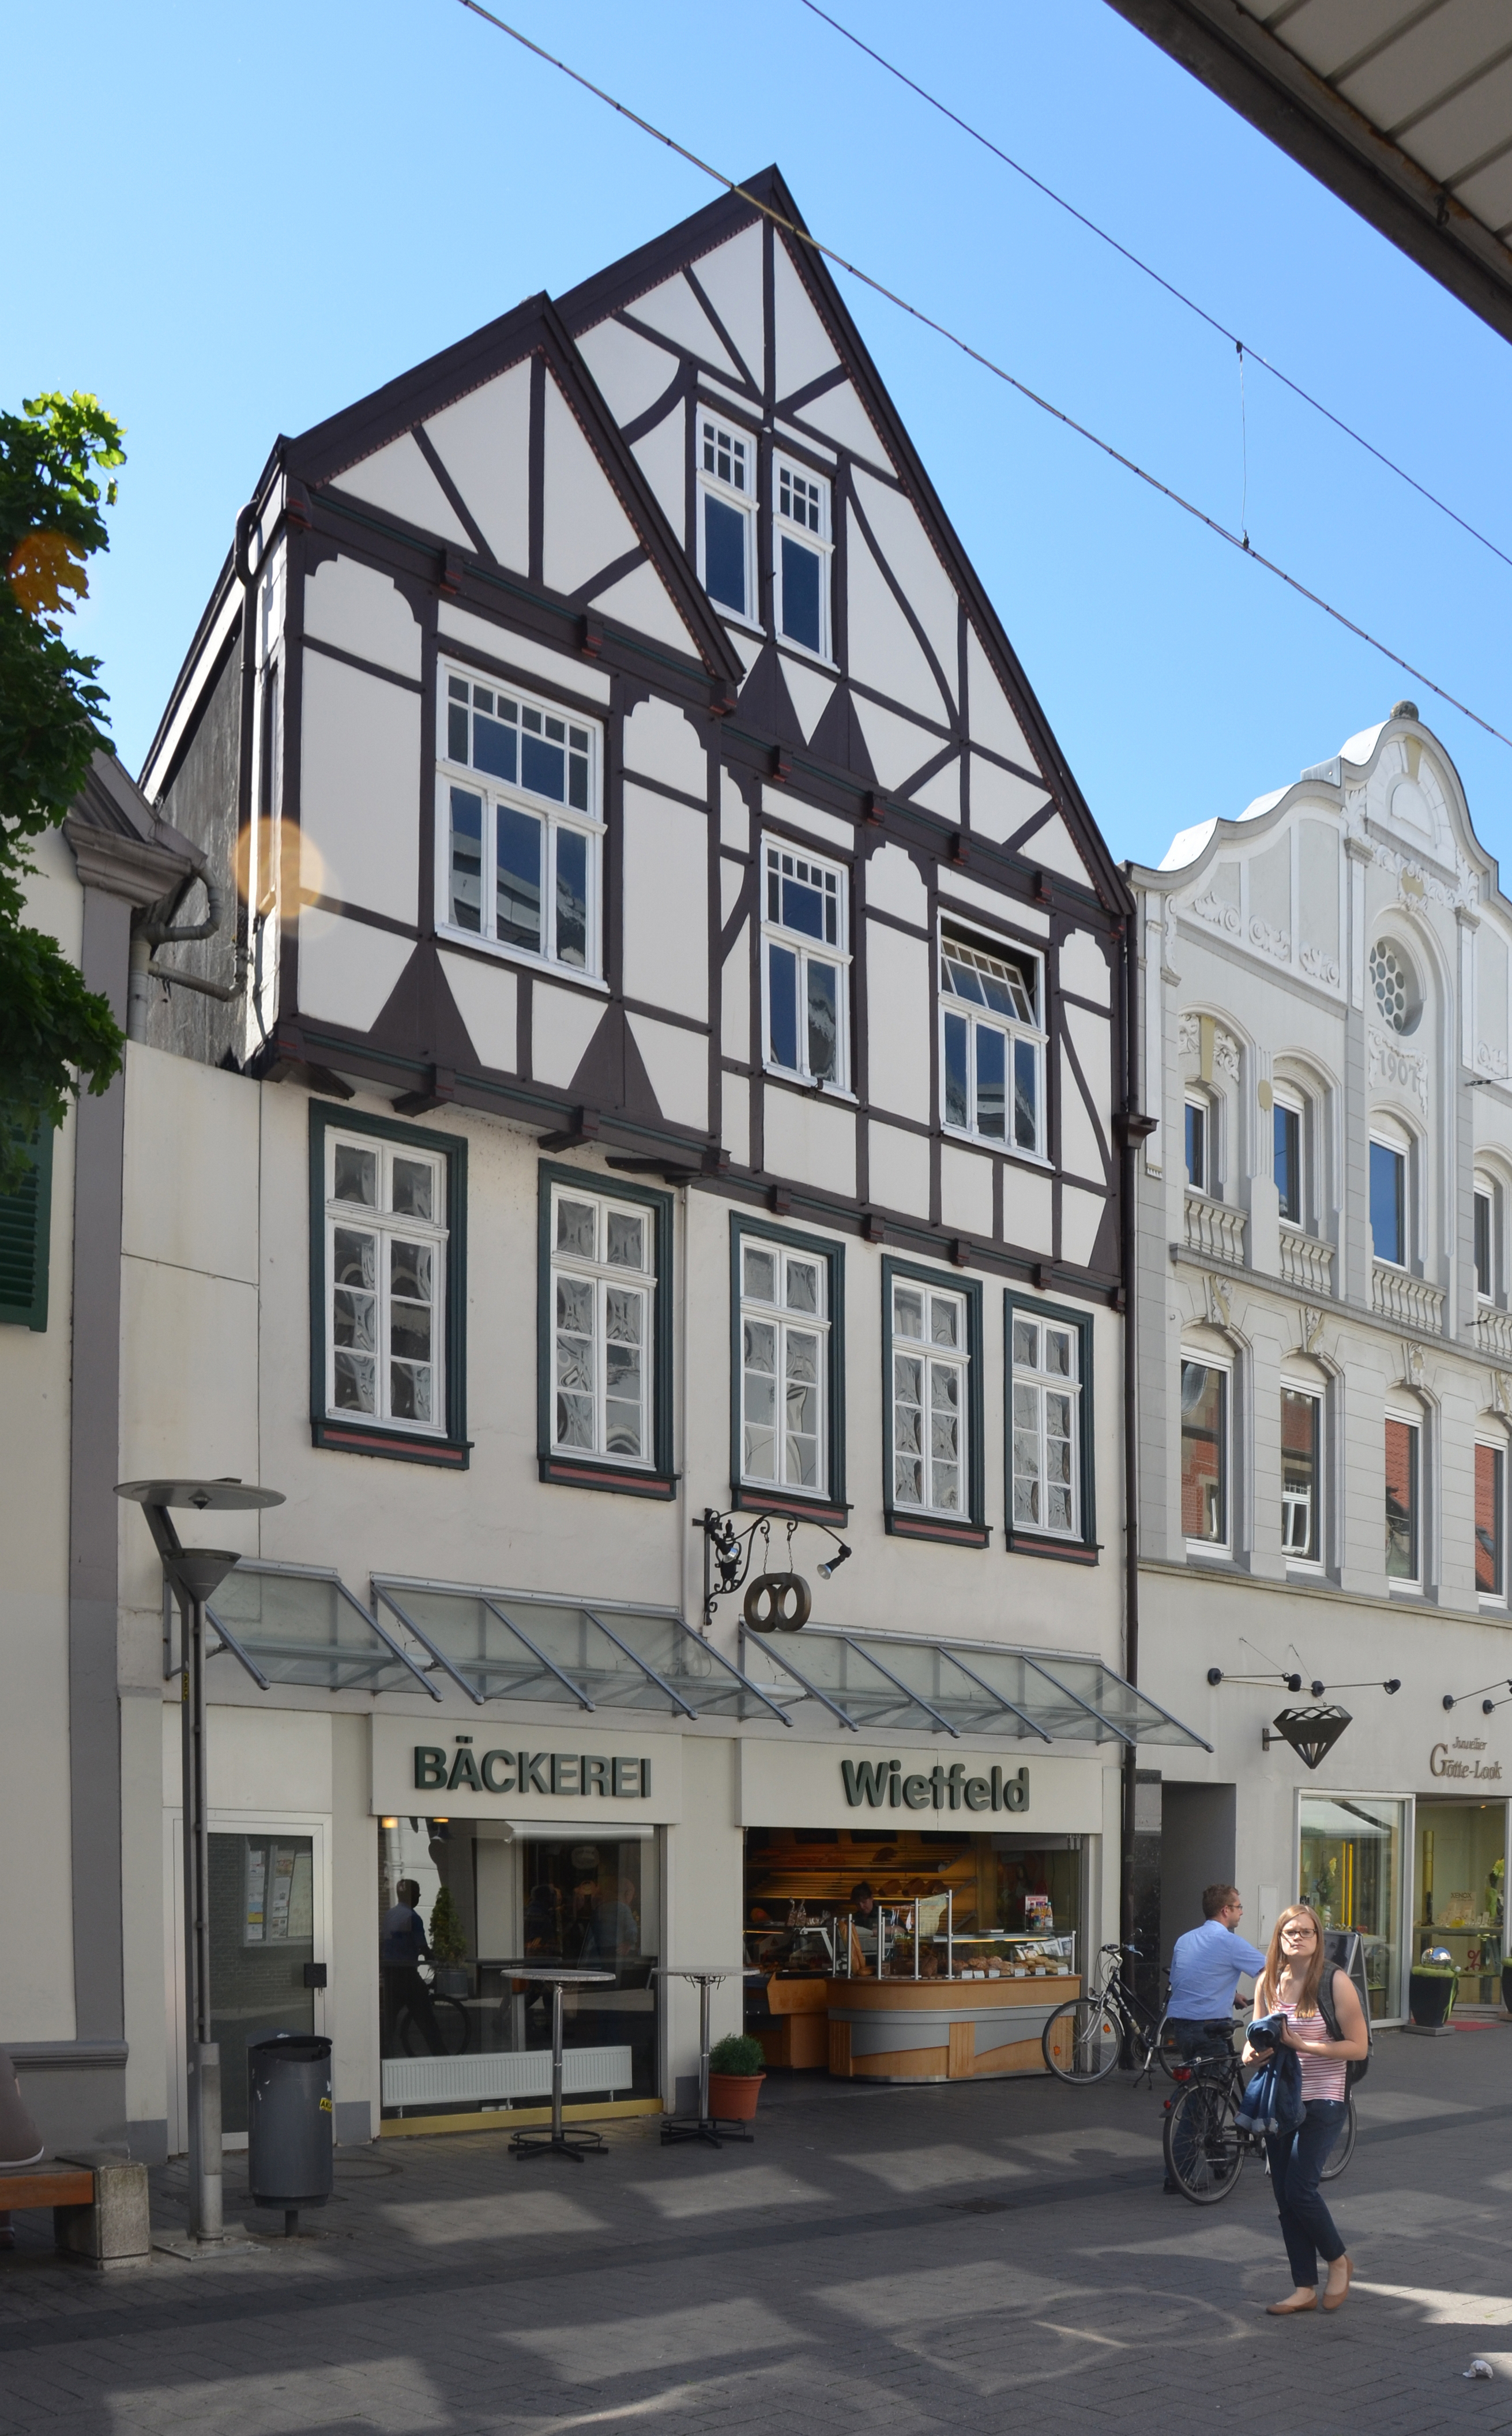 lippstadt dating